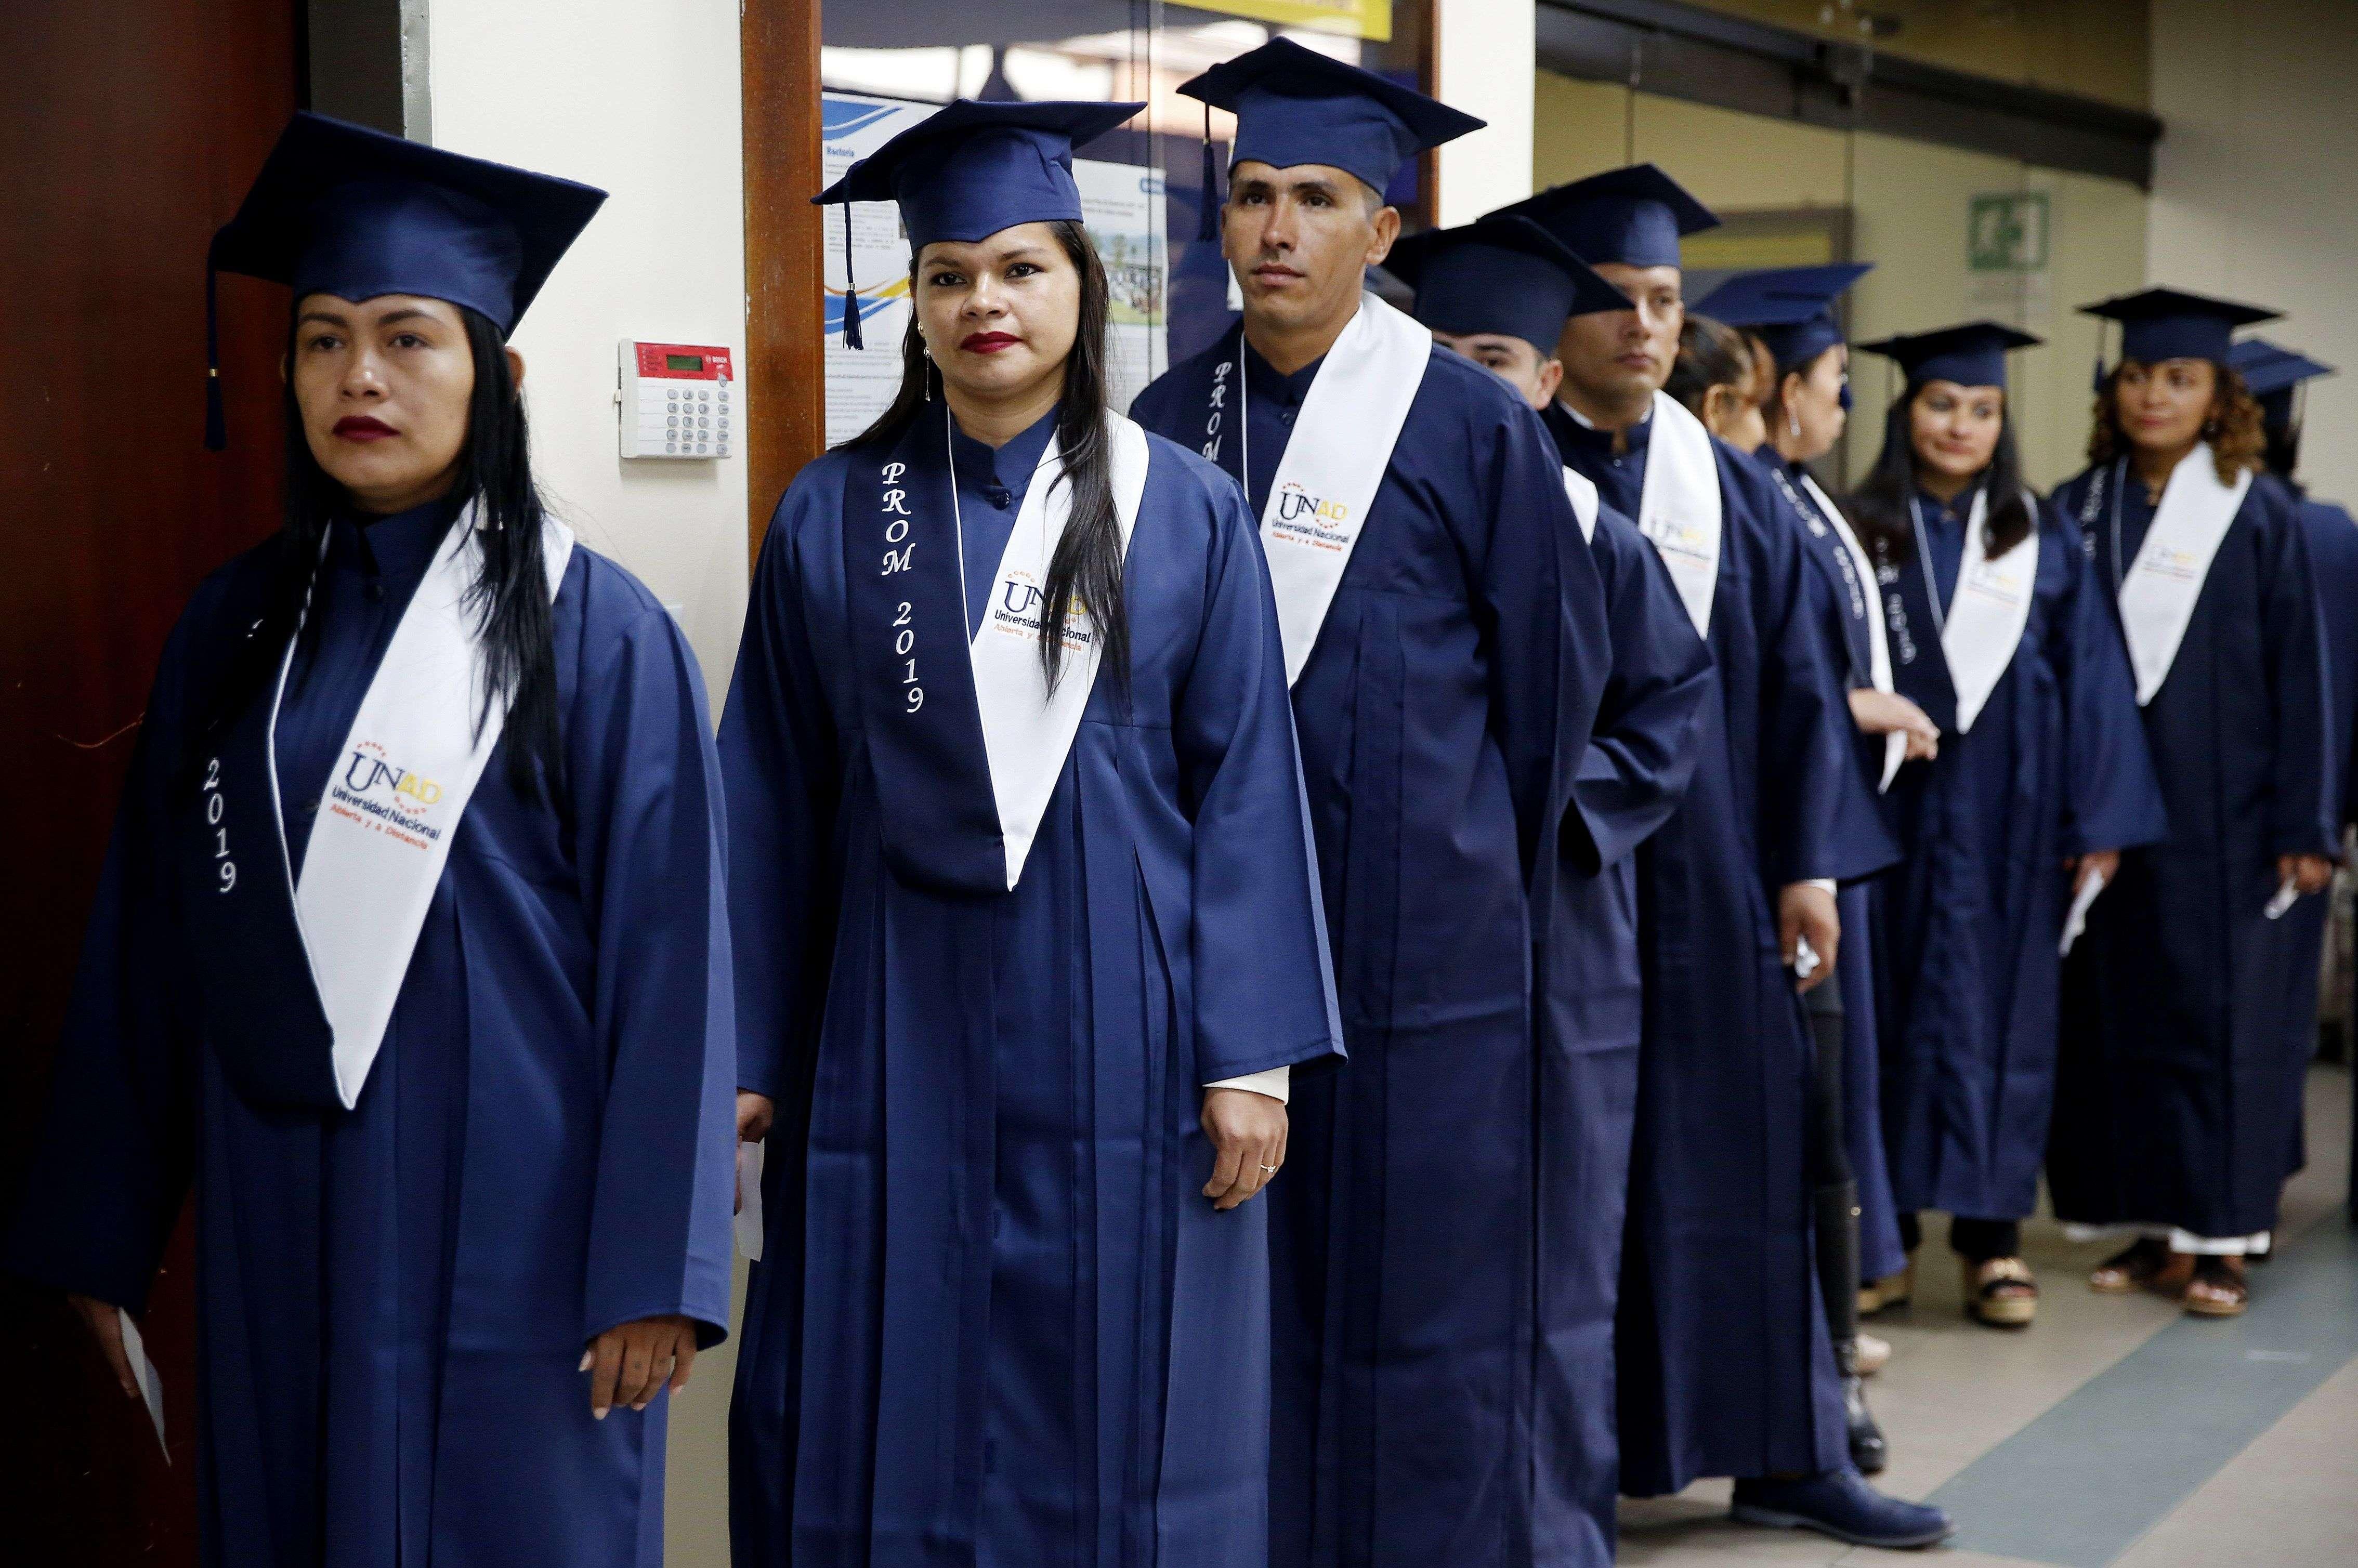 Un grupo de exguerrilleros de las FARC hacen fila para recibir su diploma de bachillerato.